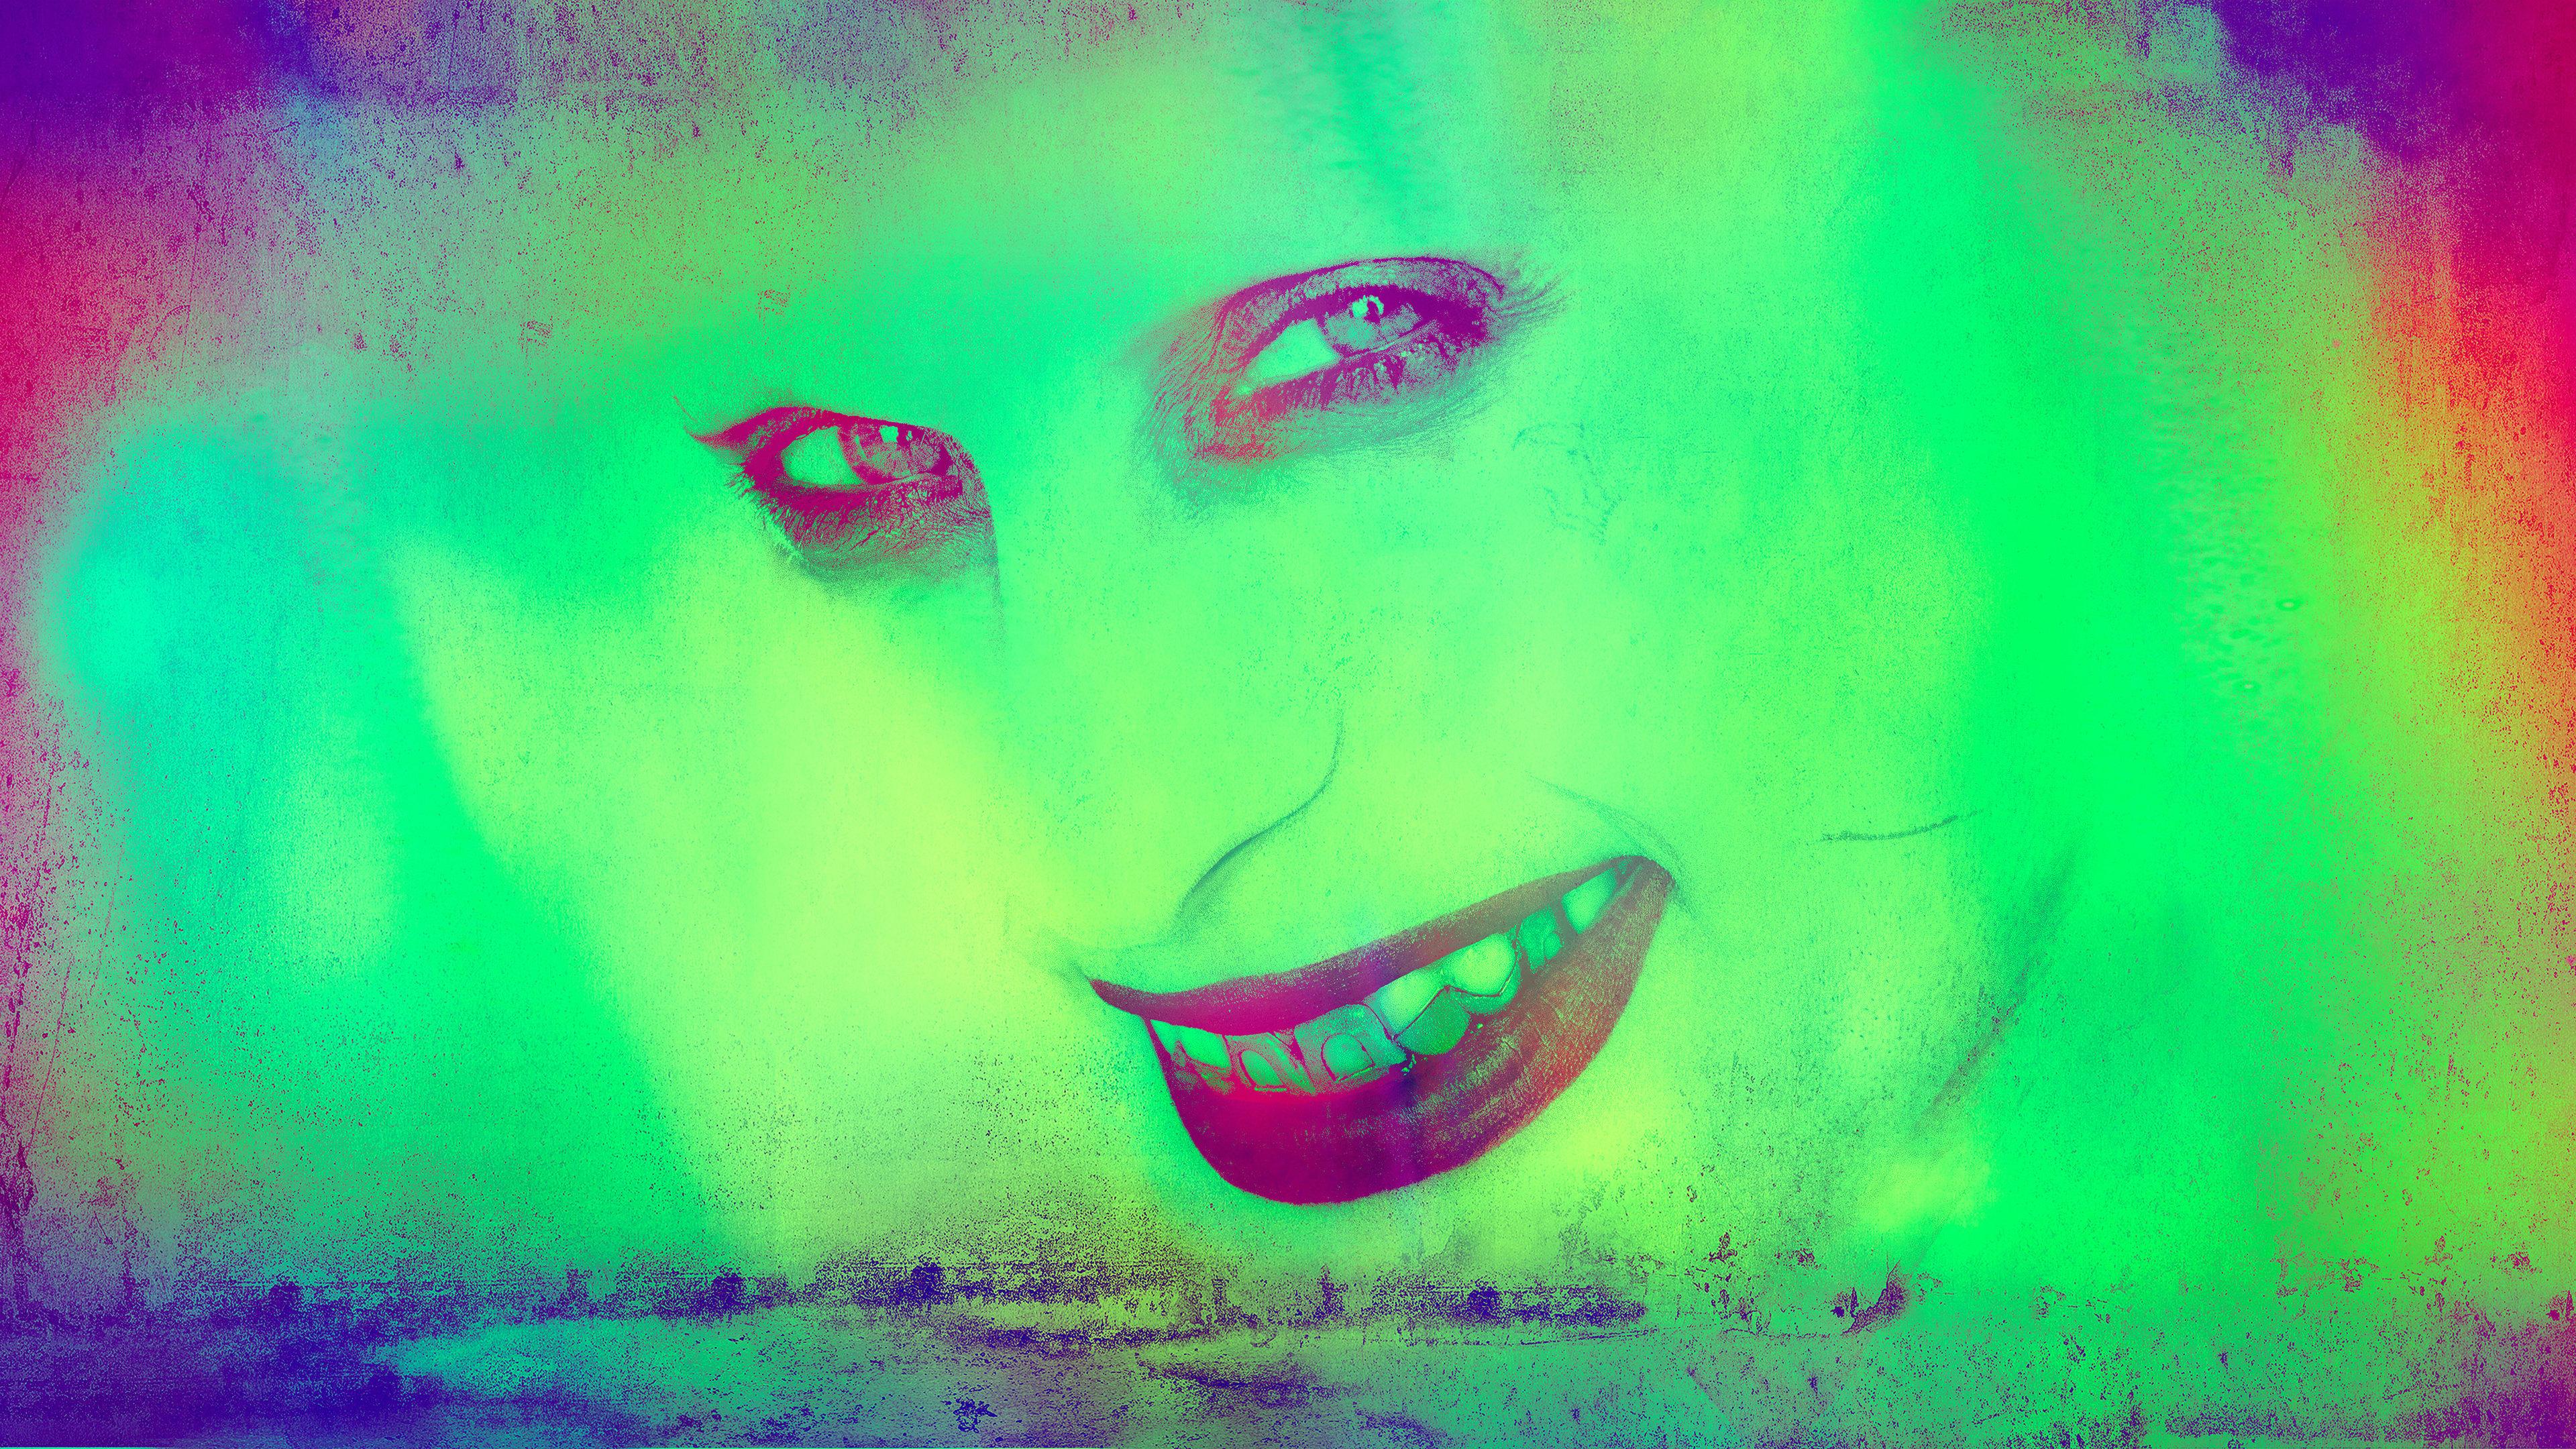 2048x2048 Deadpool 2 Movie Poster 4k Ipad Air Hd 4k: Sucide Squad Joker Green 4k Supervillain Wallpapers